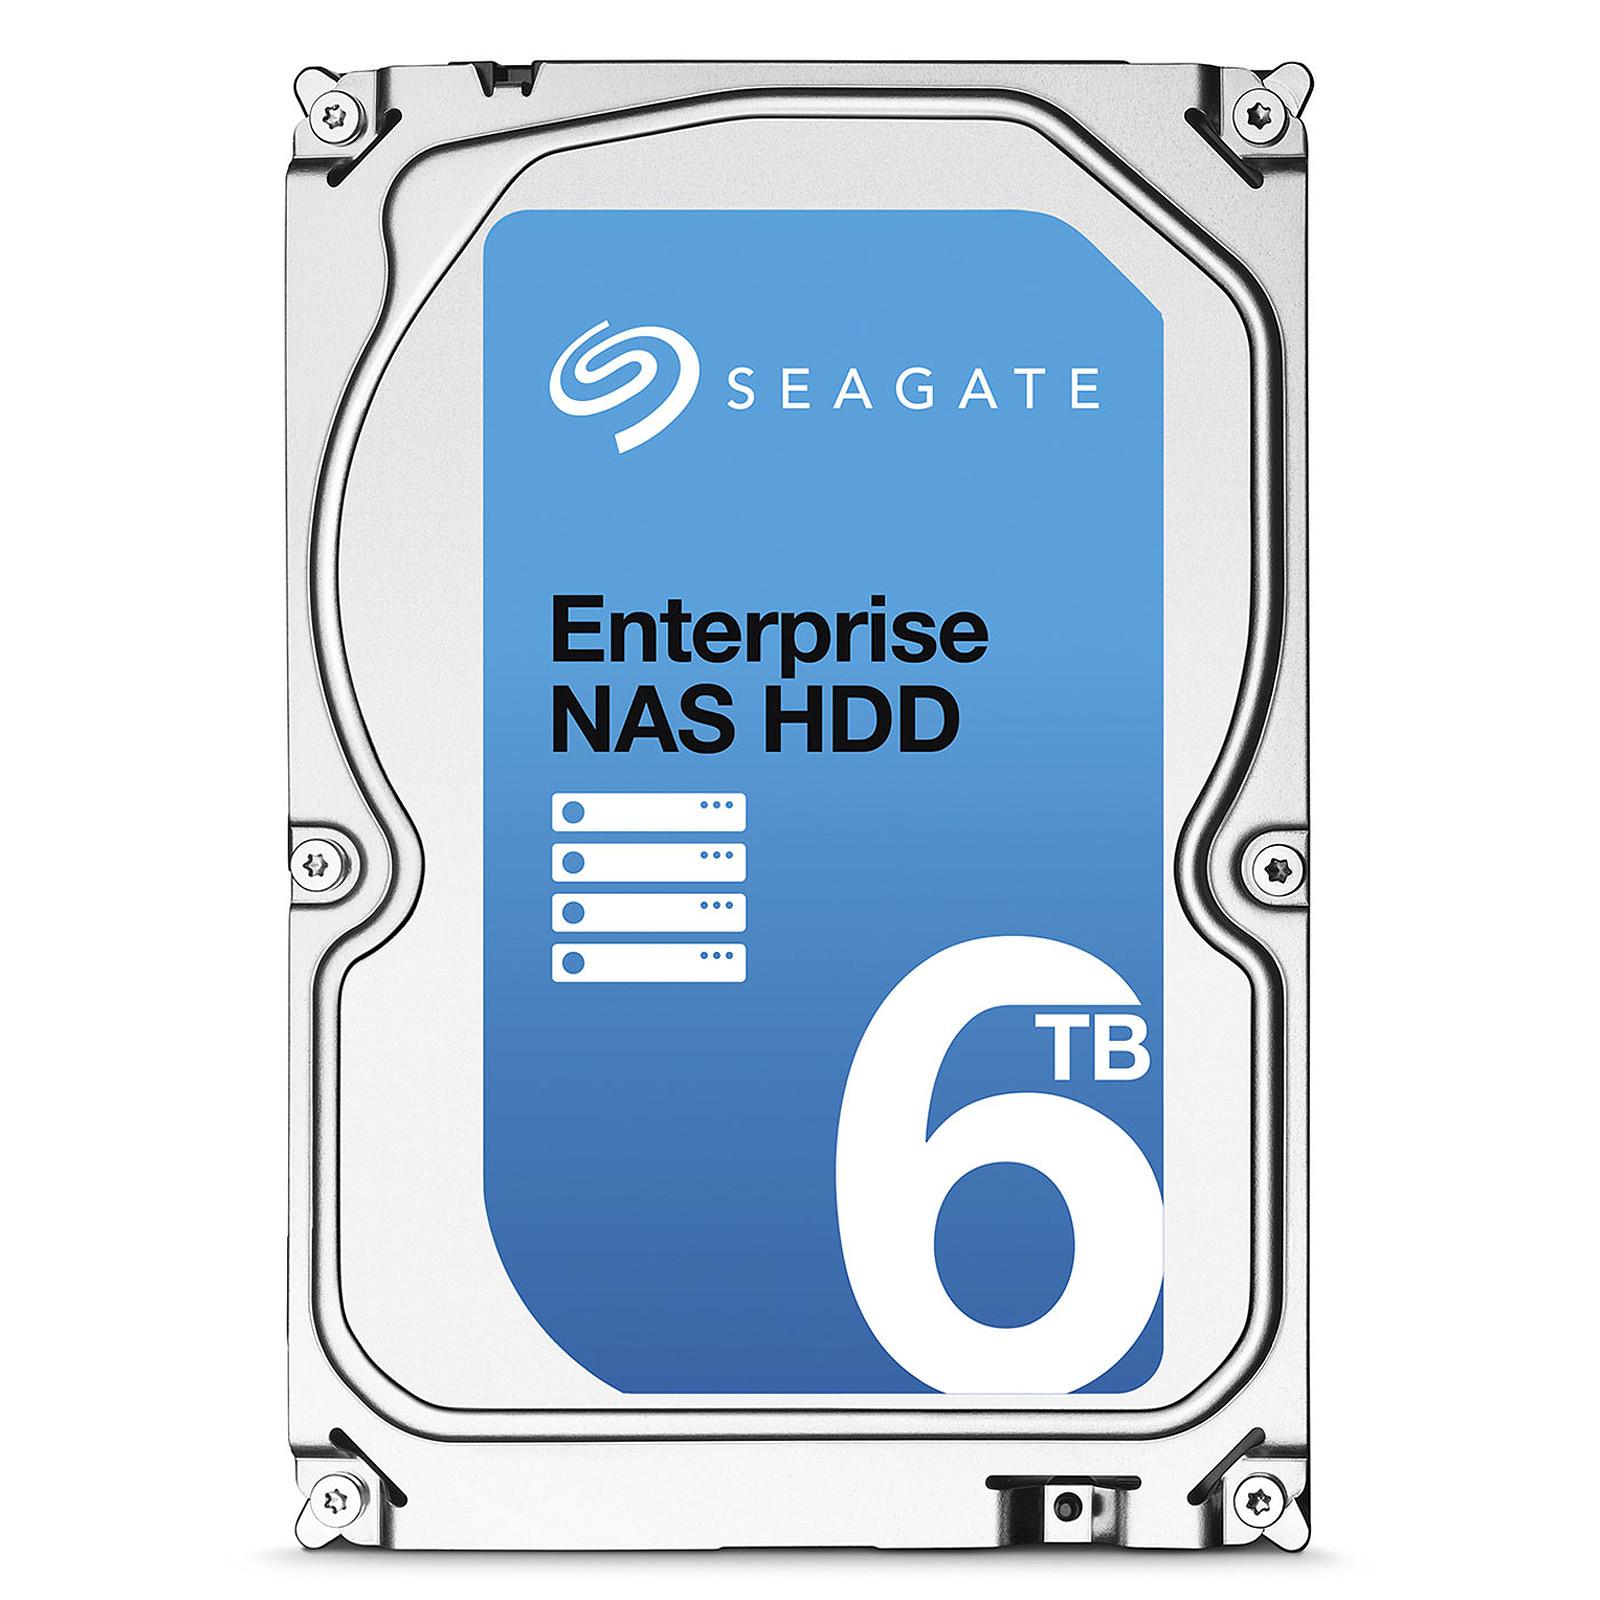 Seagate Enterprise NAS HDD 6 To